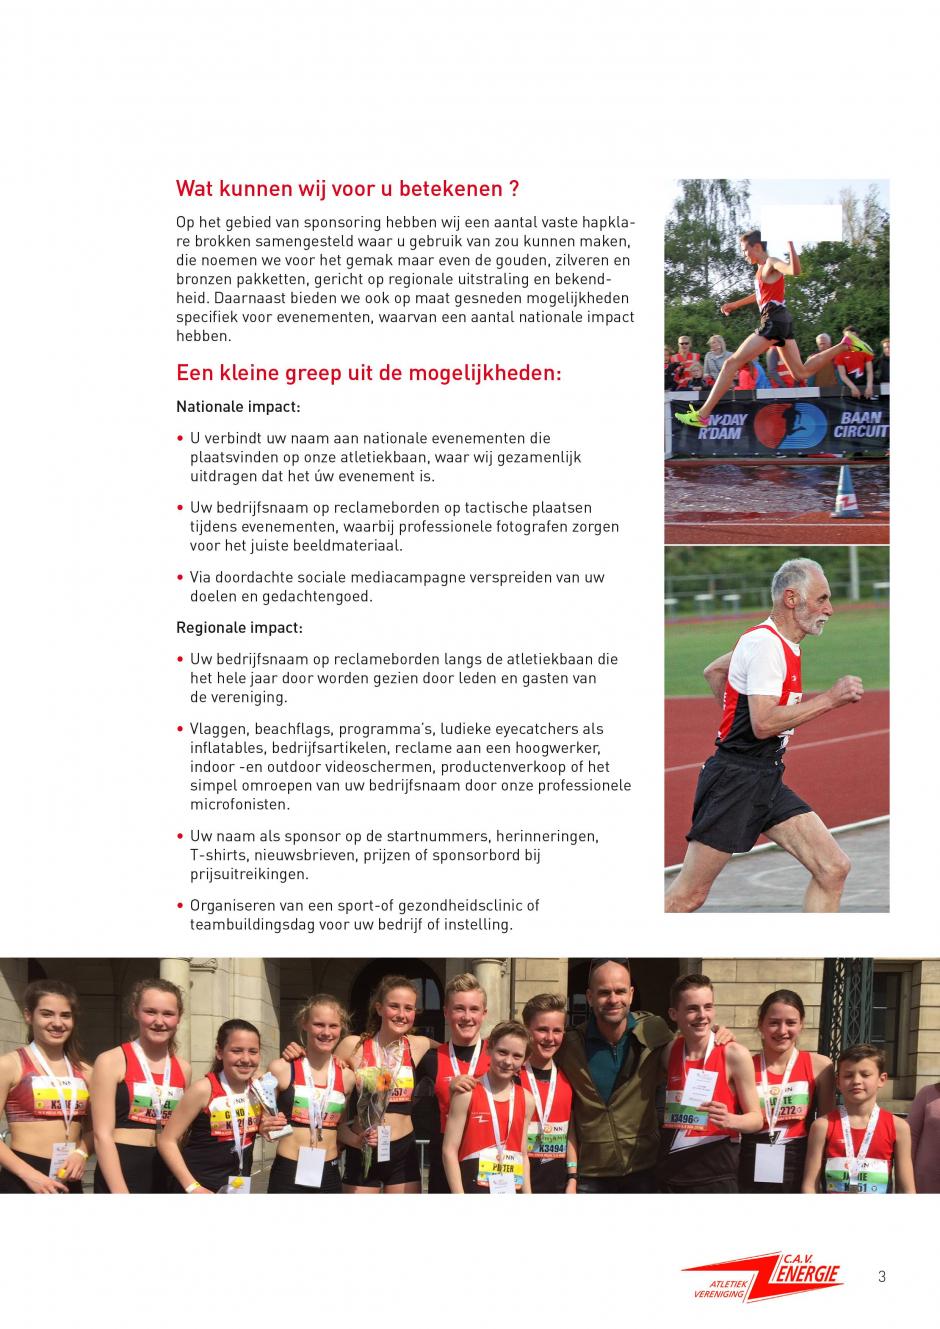 sponsoren_en_samenwerken_pagina_3_2.jpg